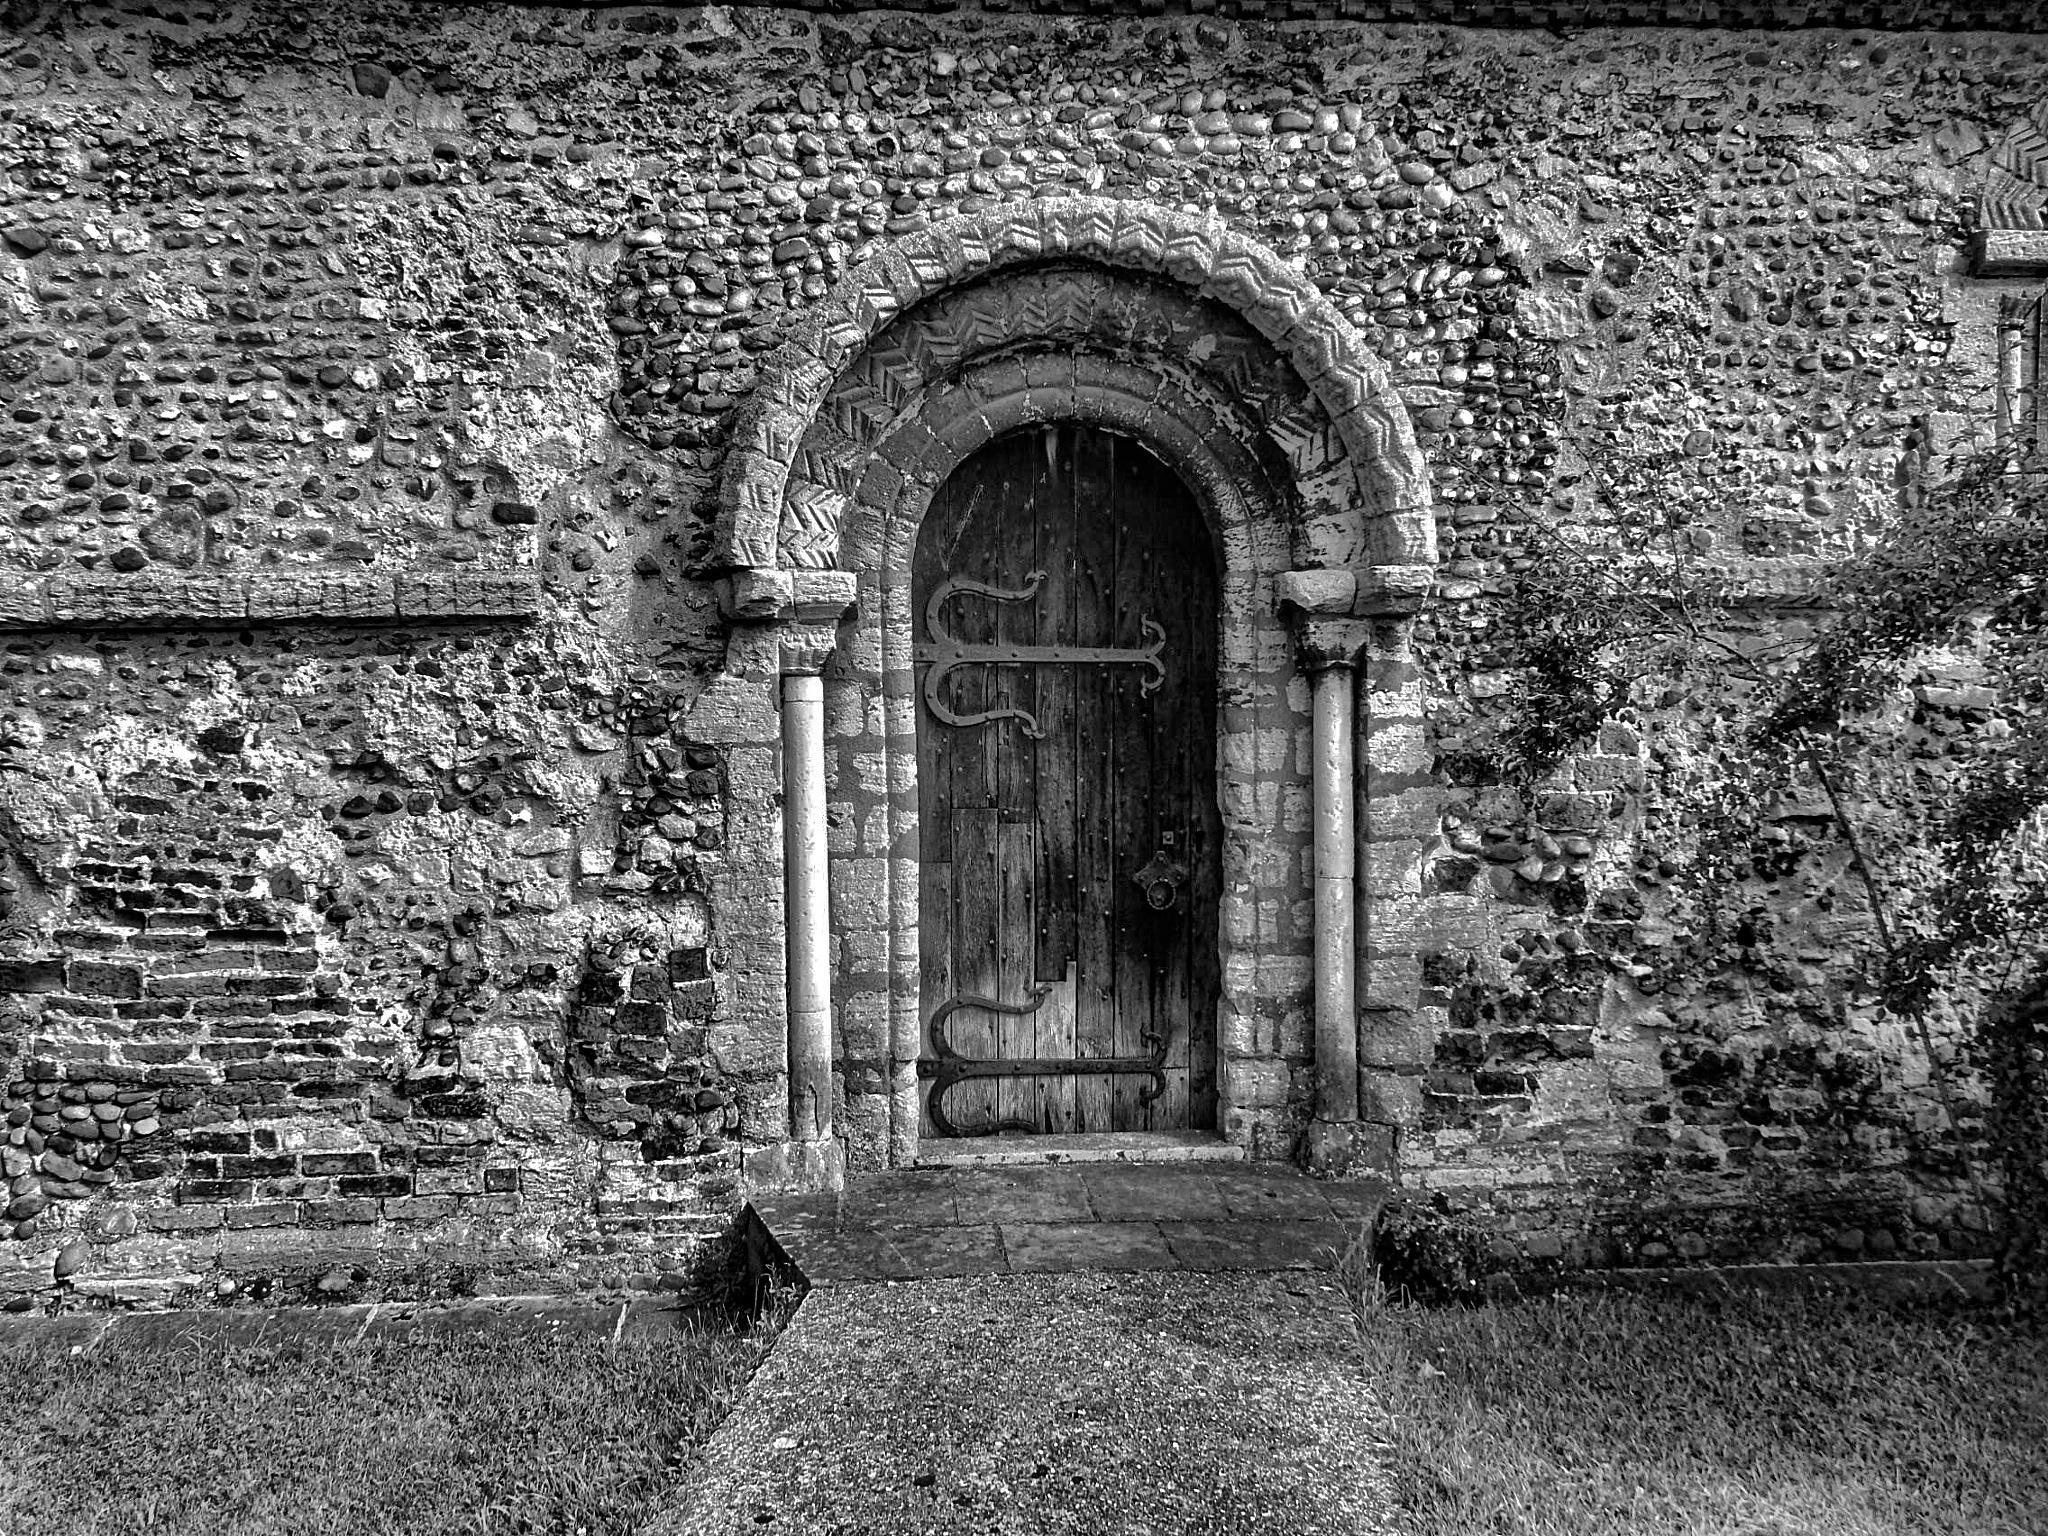 The Door by Simon Hill Photographer